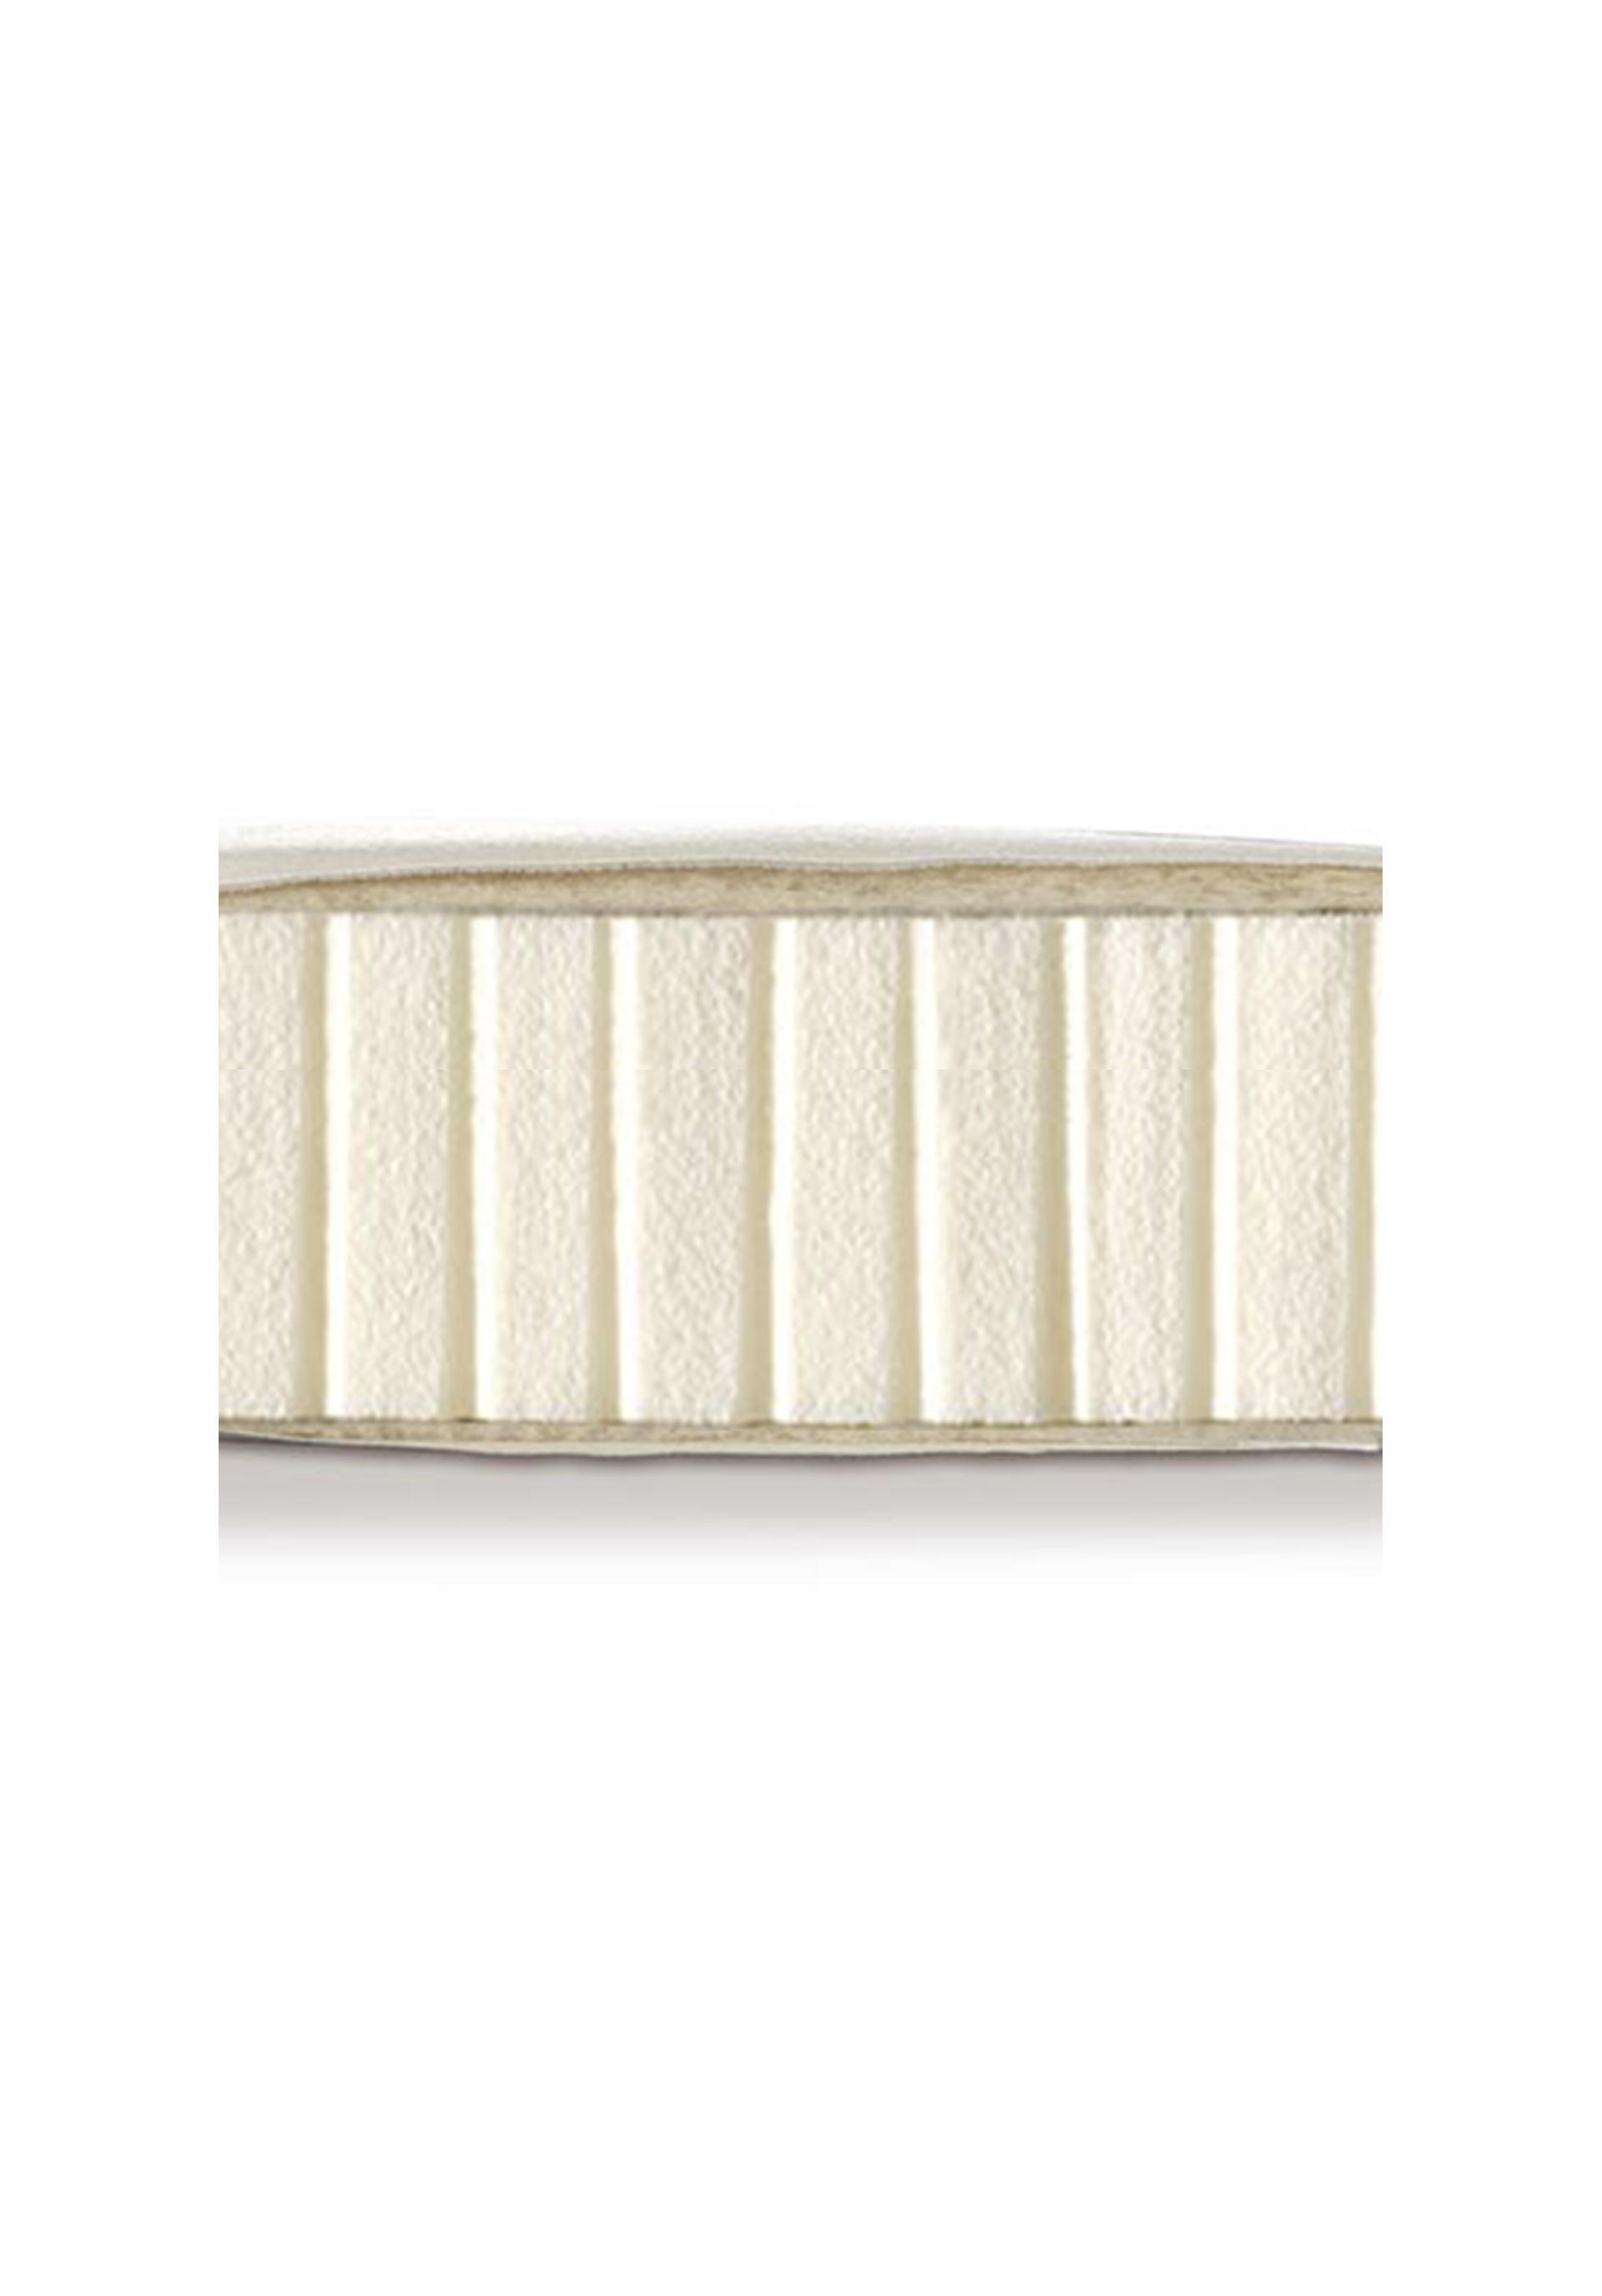 matratzen topper inside komfort hessnatur sterreich. Black Bedroom Furniture Sets. Home Design Ideas